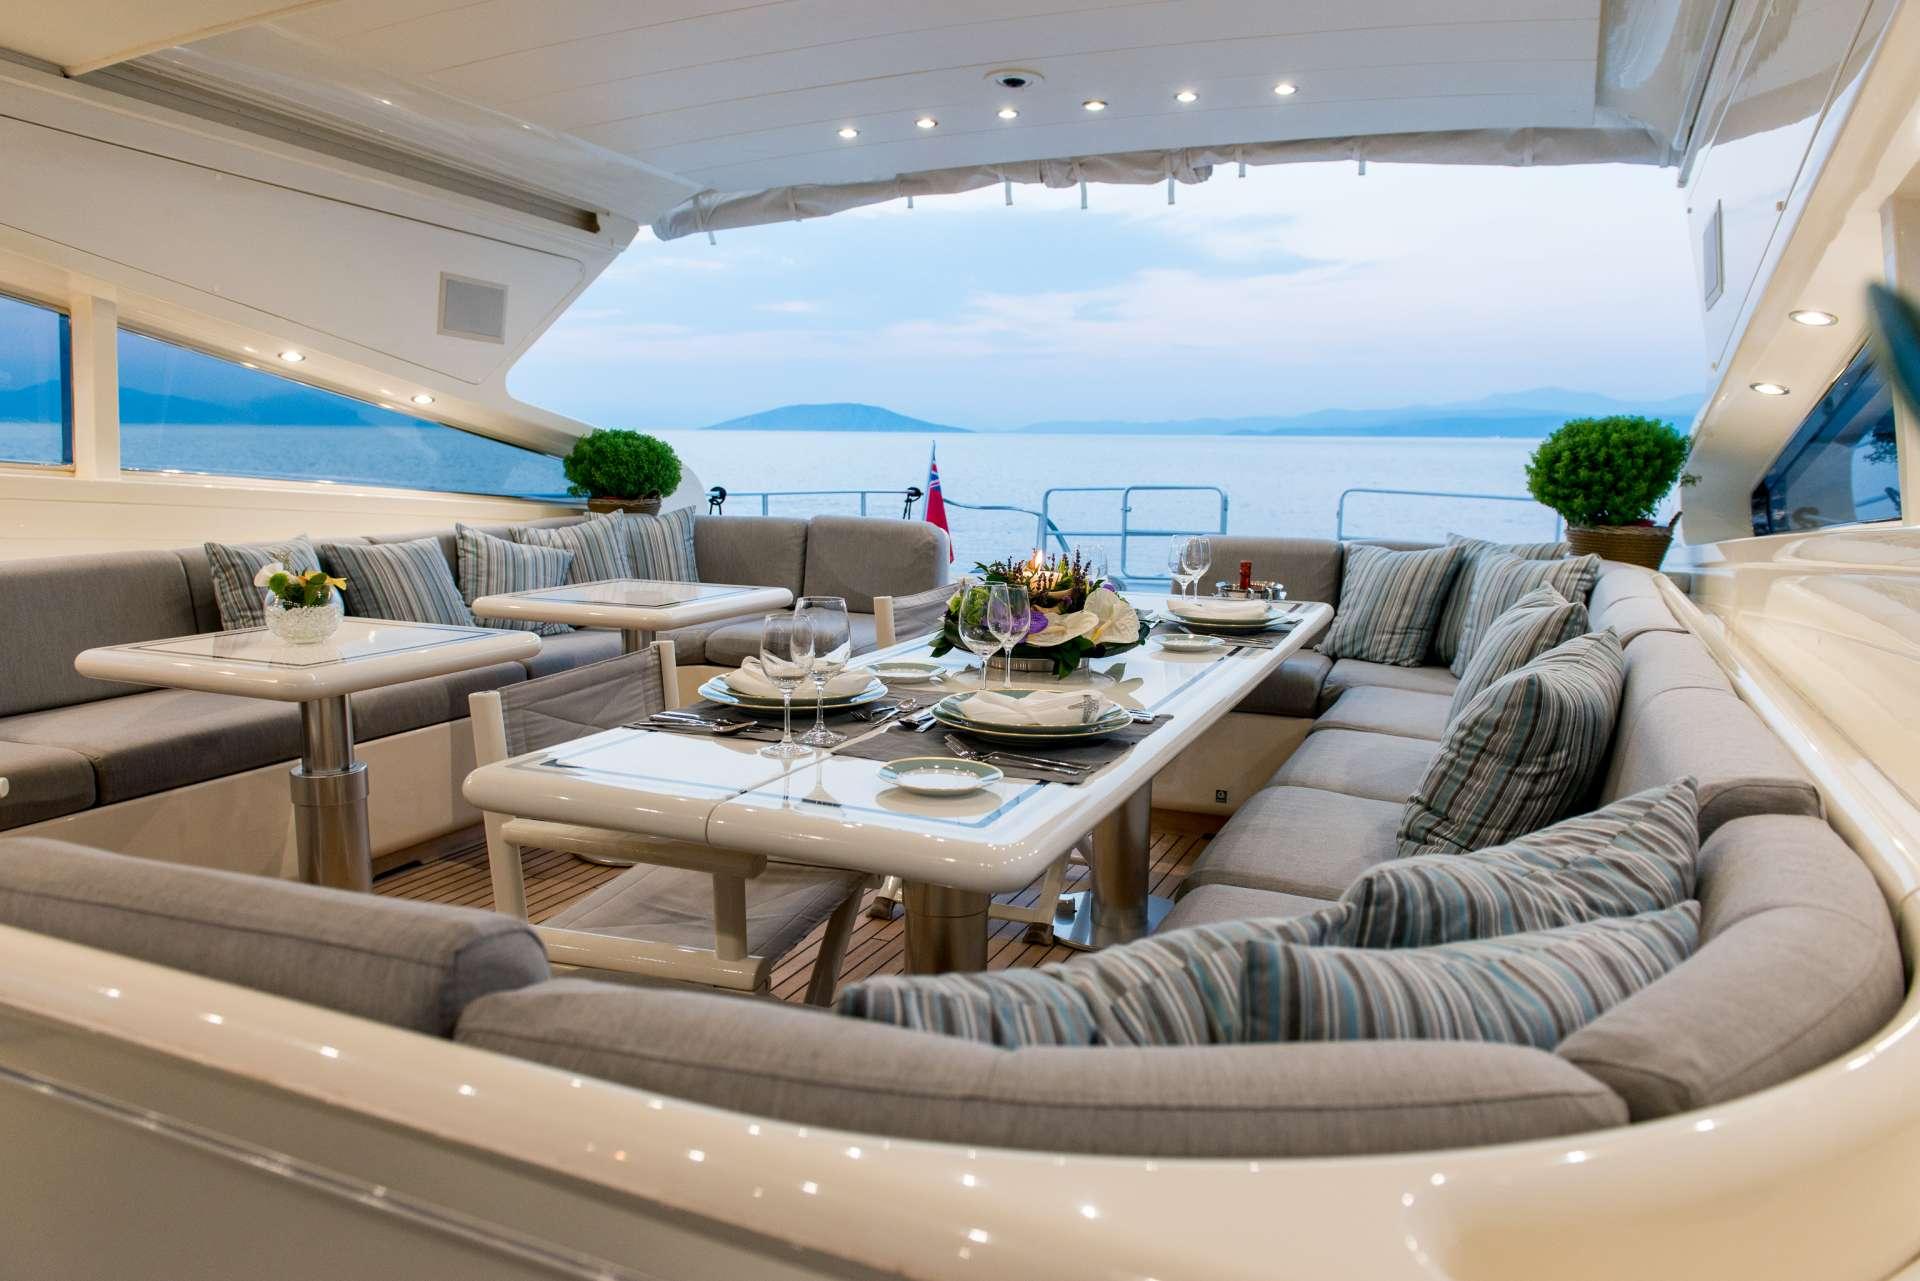 motor yacht ROMACHRIS II